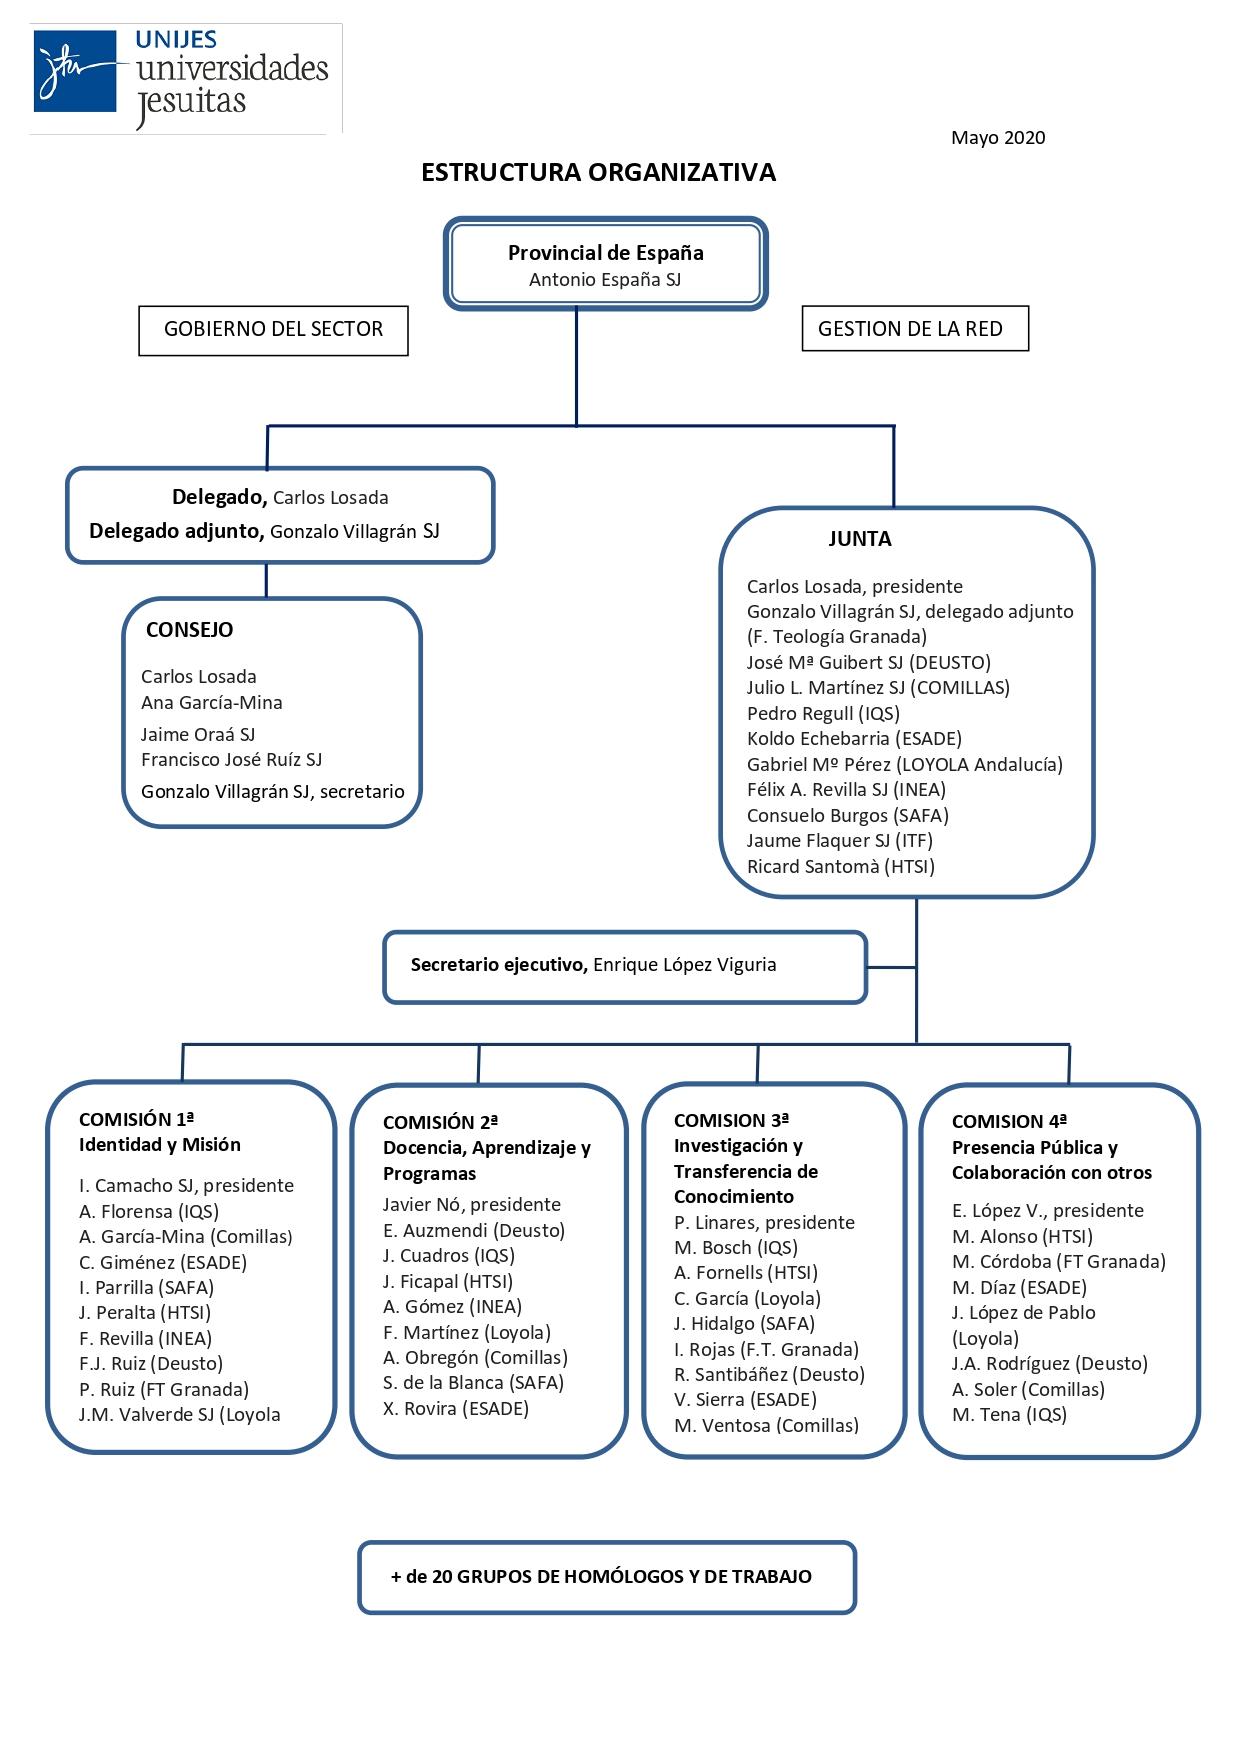 Estructura Organizativa 2019 2020 Unijes (Mayo 2020)